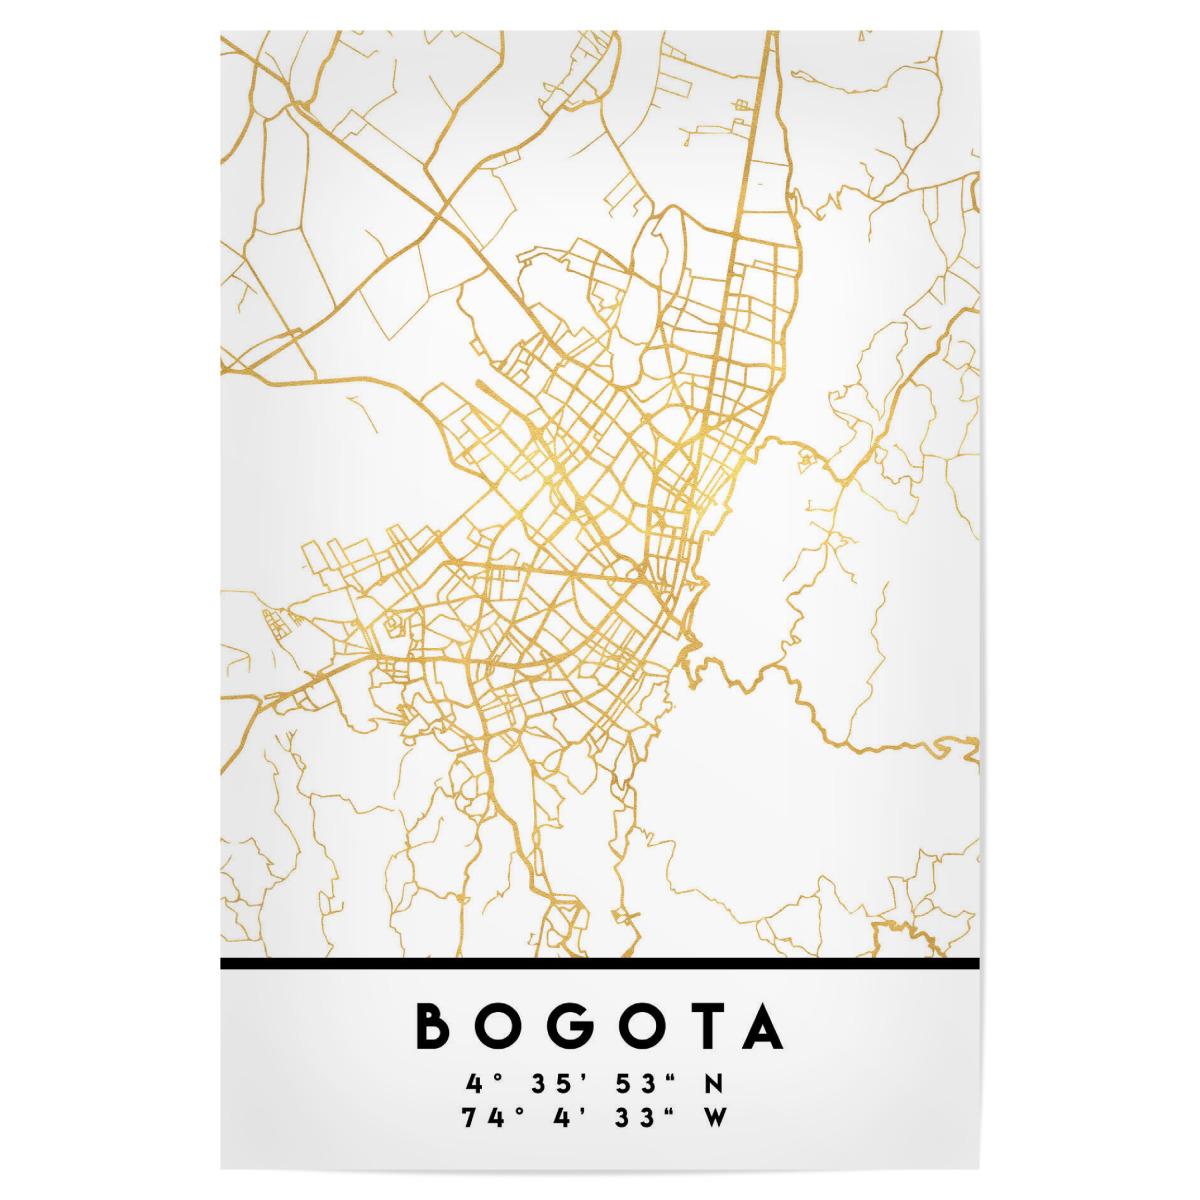 BOGOTA COLOMBIA STREET MAP ART als Poster bei artboxONE kaufen on